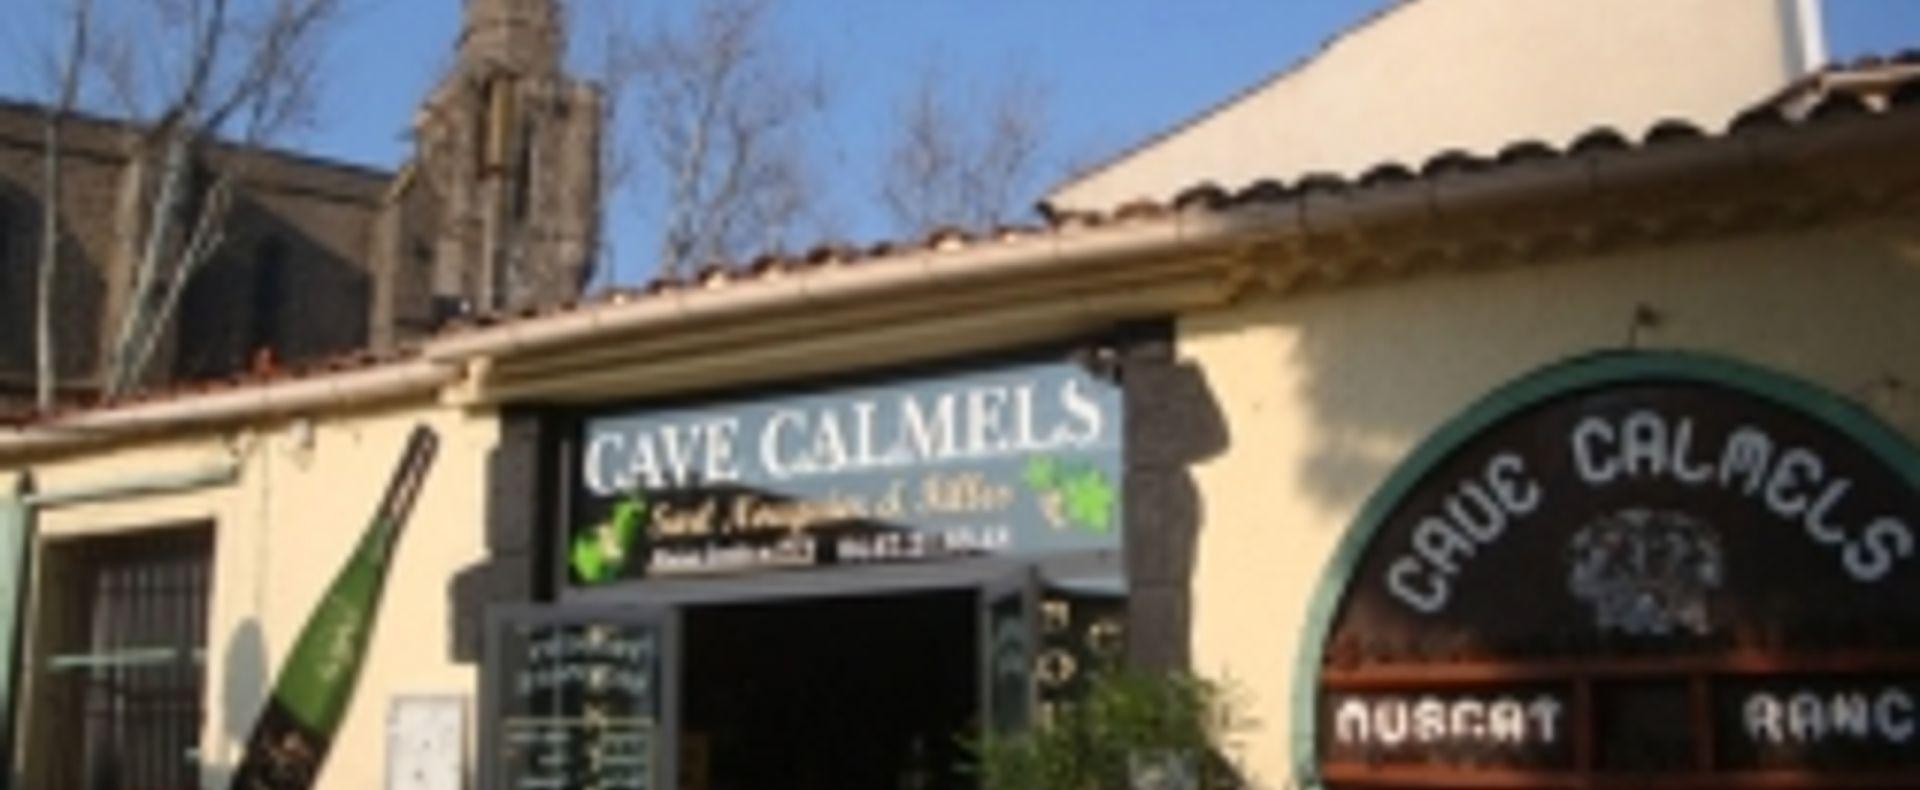 CAVES CALMELS SARL NOUGUIER ET FILLES